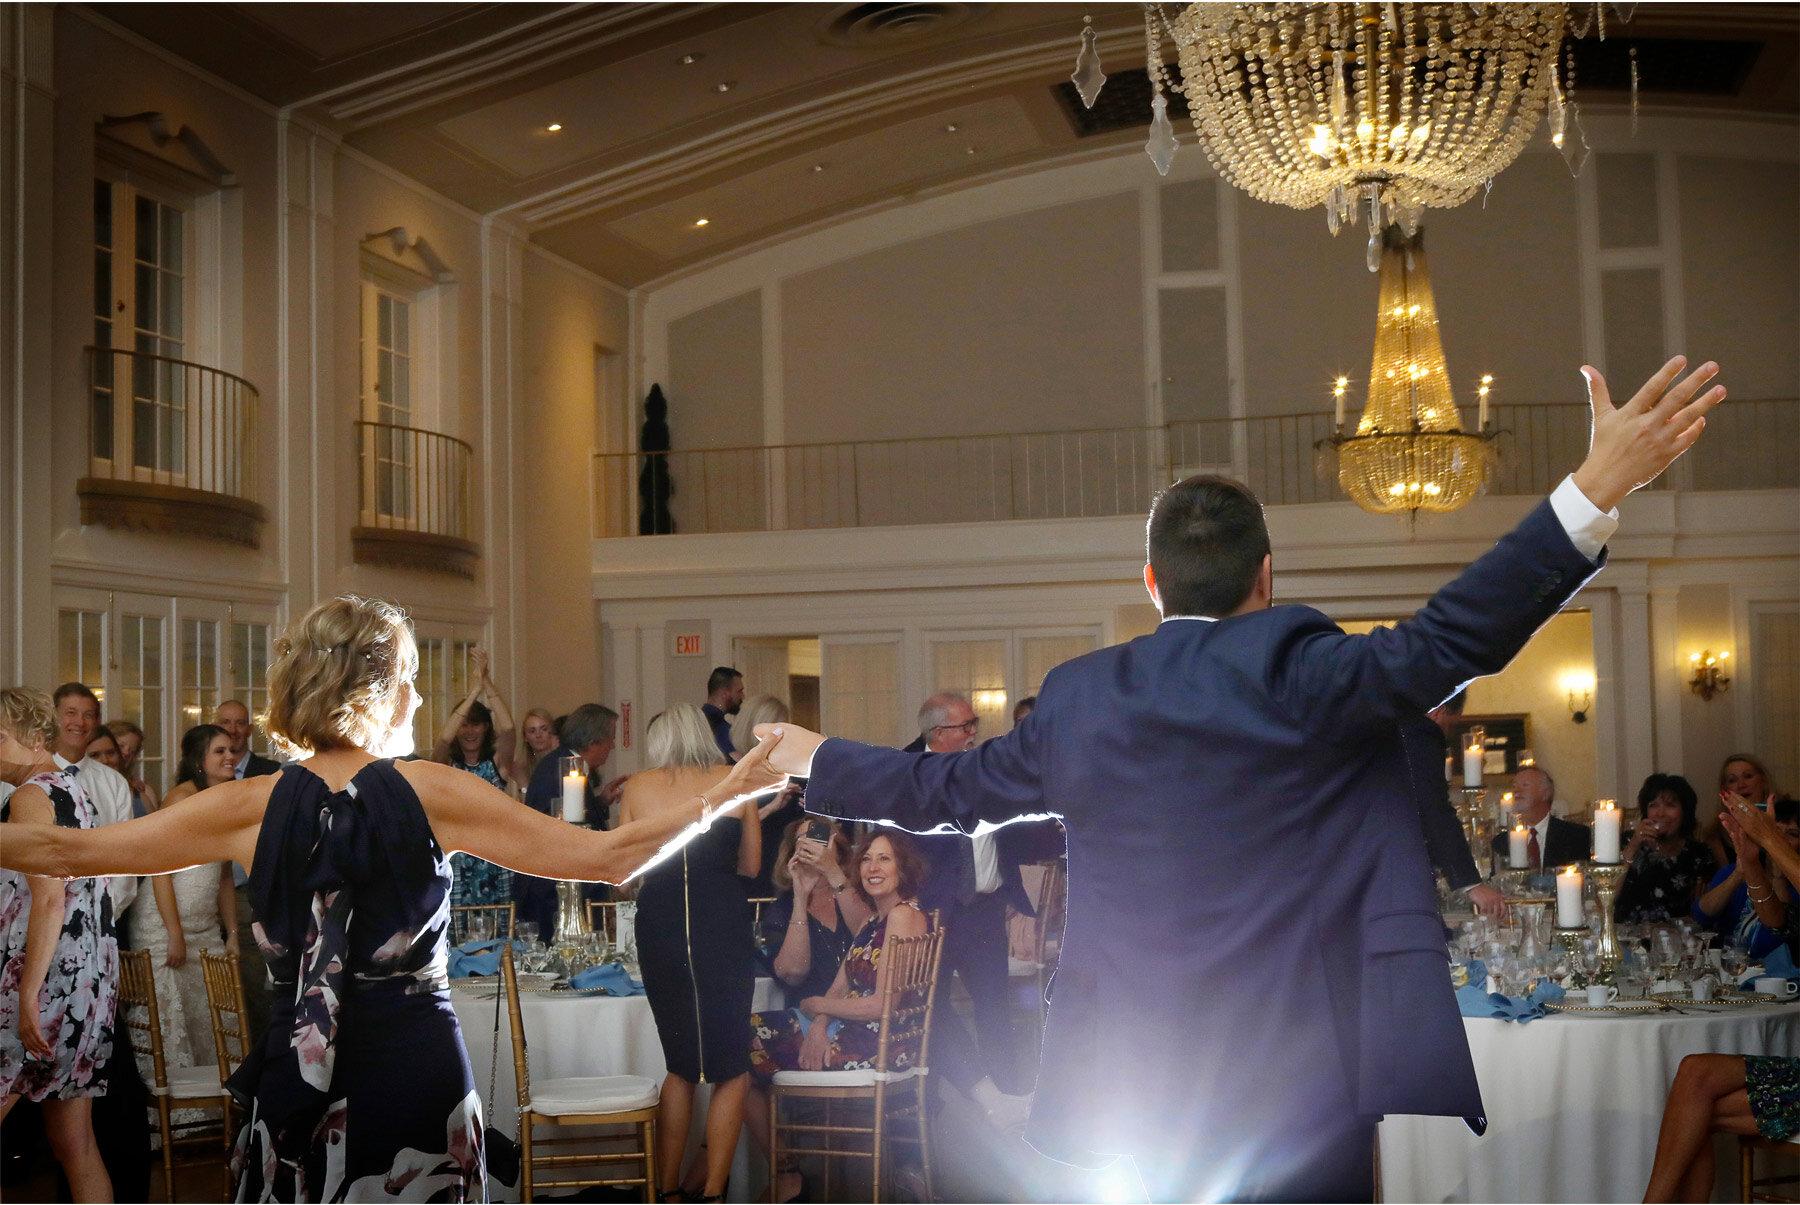 21-Vick-Photography-Wedding-Minnetonka-Minnesota-Lafayette-Club-Reception-First-Dance-Mother-Katie-and-David.jpg.jpg